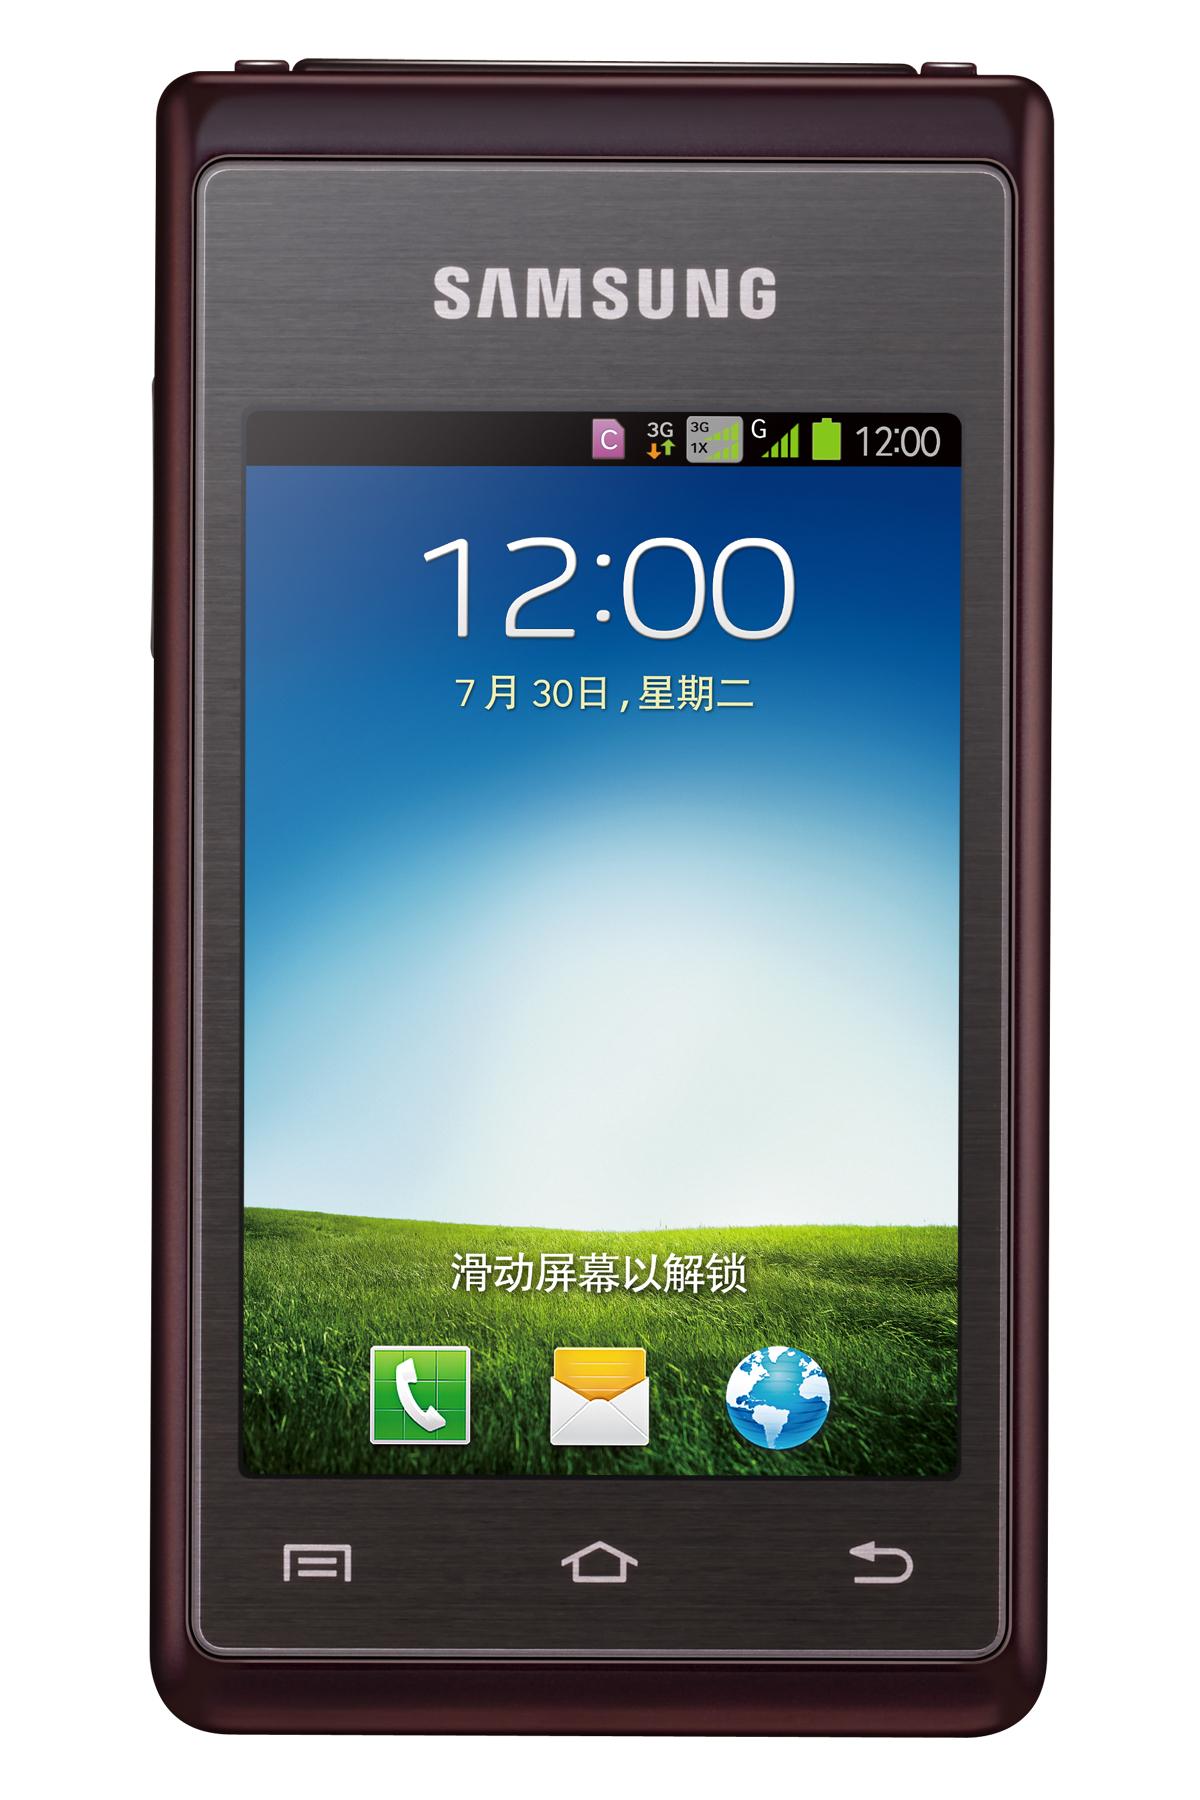 Samsung Hennessy flip phone Android 4.1 de tapa de frente cerrado pantalla